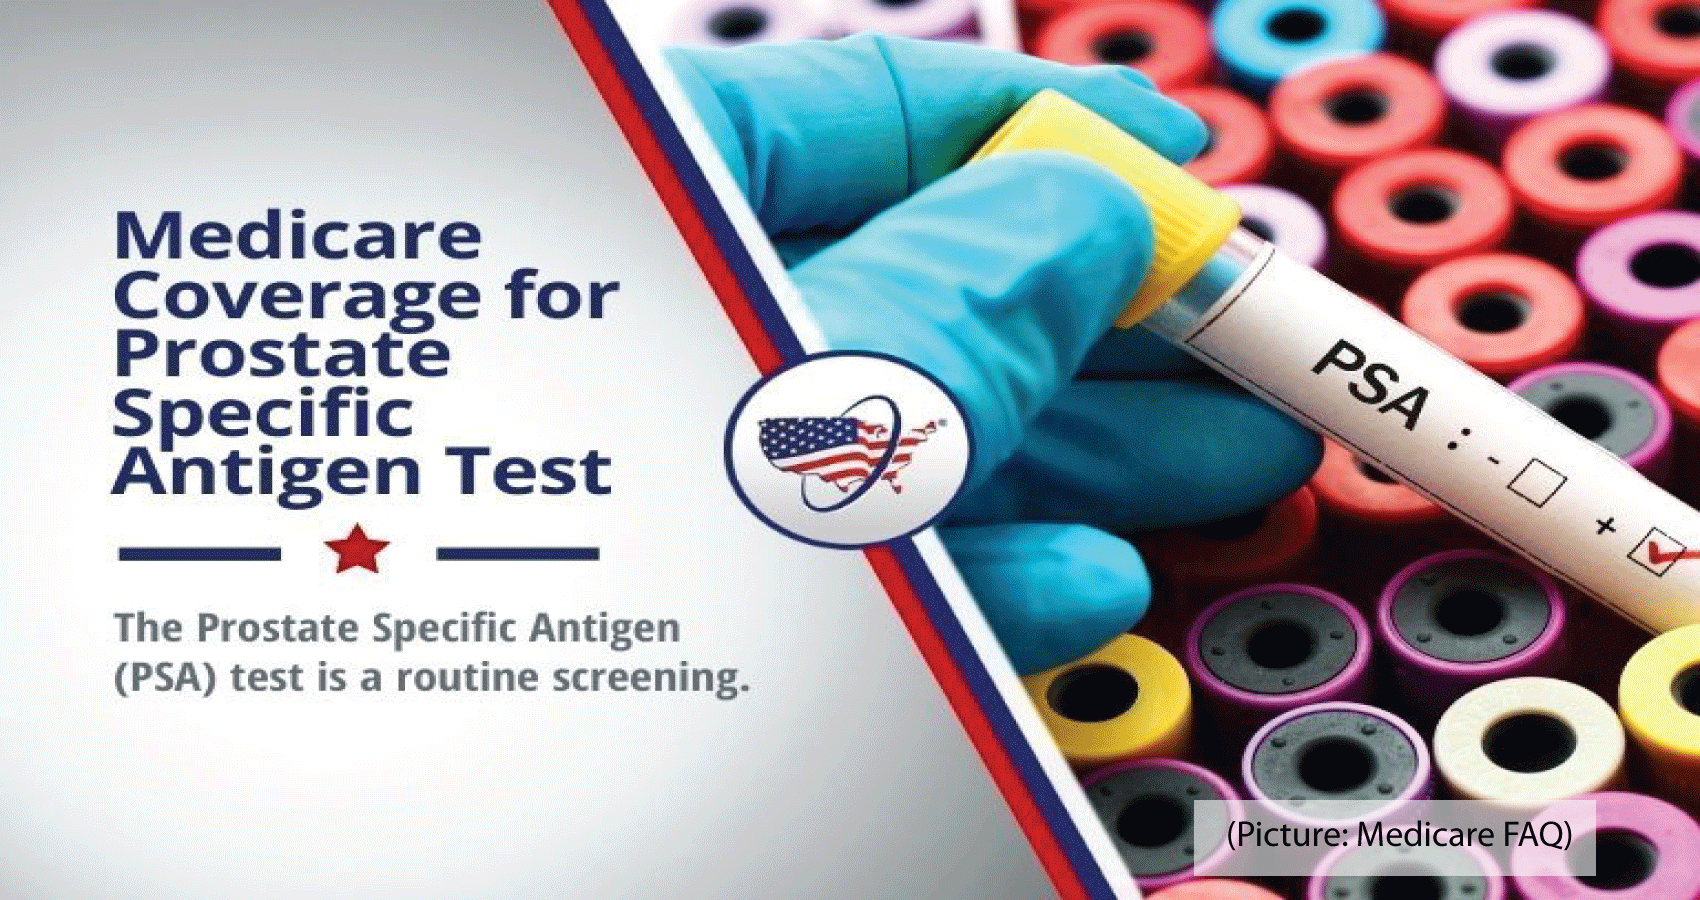 Medicare Covers Annual PSA-Based Screenings